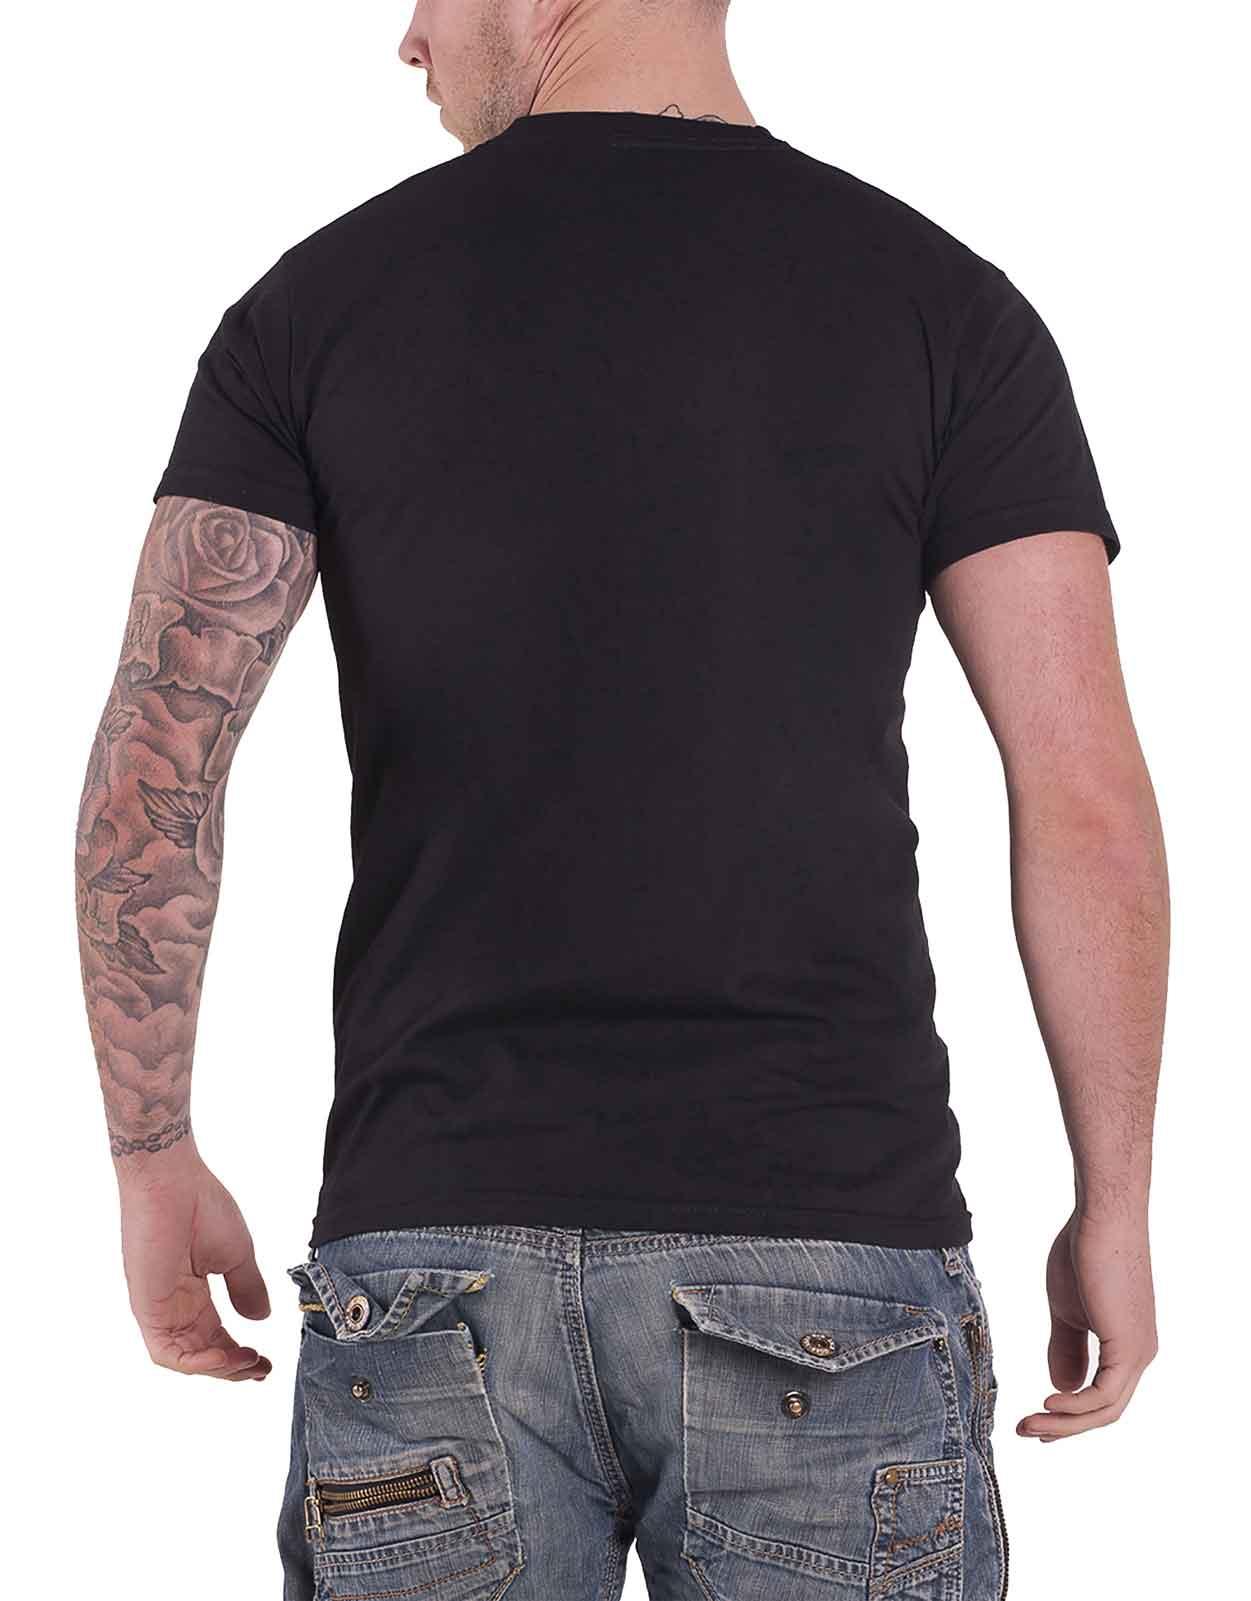 Officiel-The-Doors-T-Shirt-Jim-Morrison-poete-americain-Break-On-Through-Homme-NEUF miniature 45